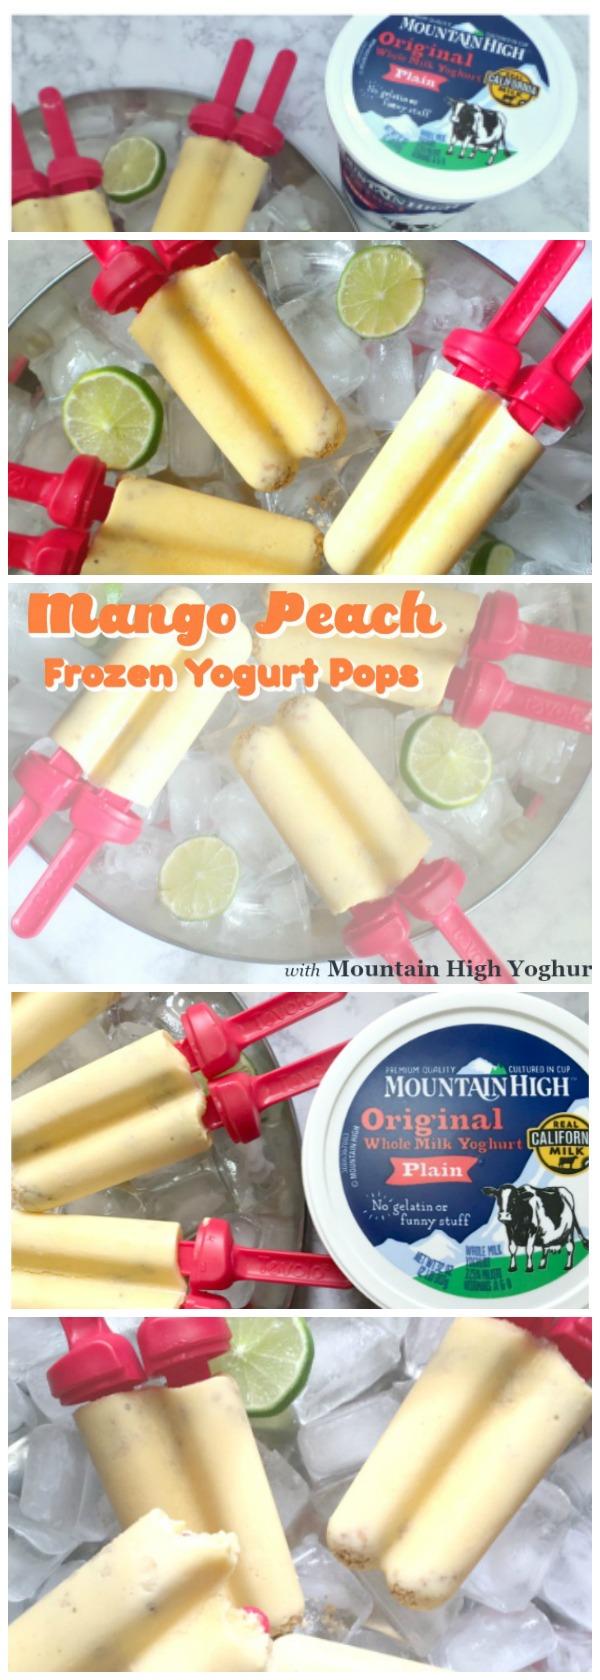 Frozen Yogurt Mango Peach Pops with Mountain High Yoghurt via Atypical Familia by Lisa Quinones Fontanez